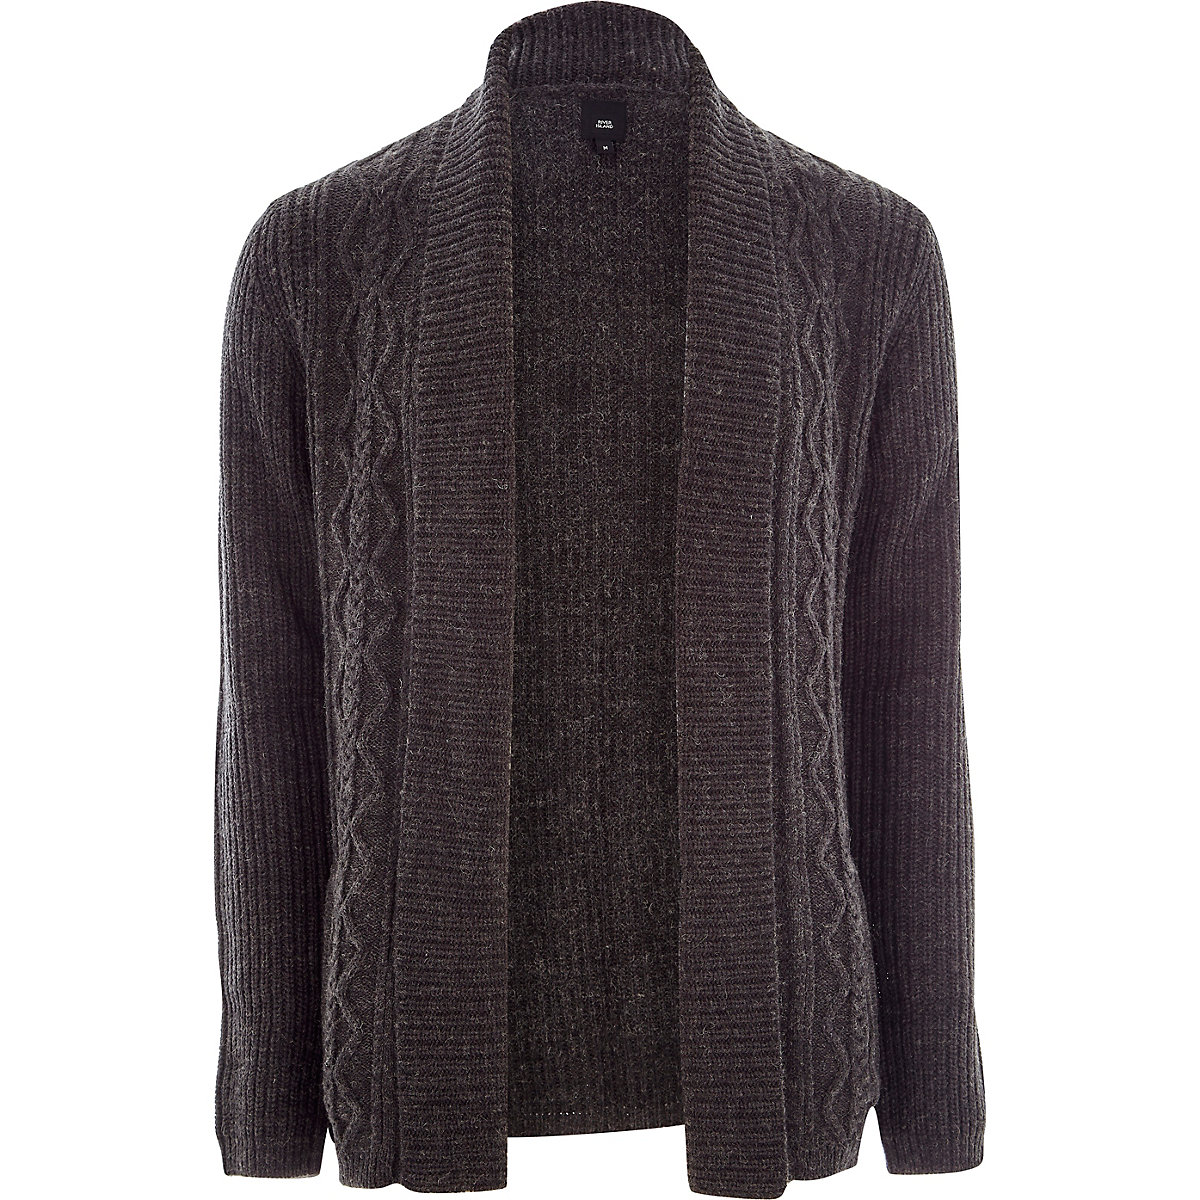 Dark grey cable knit regular fit cardigan